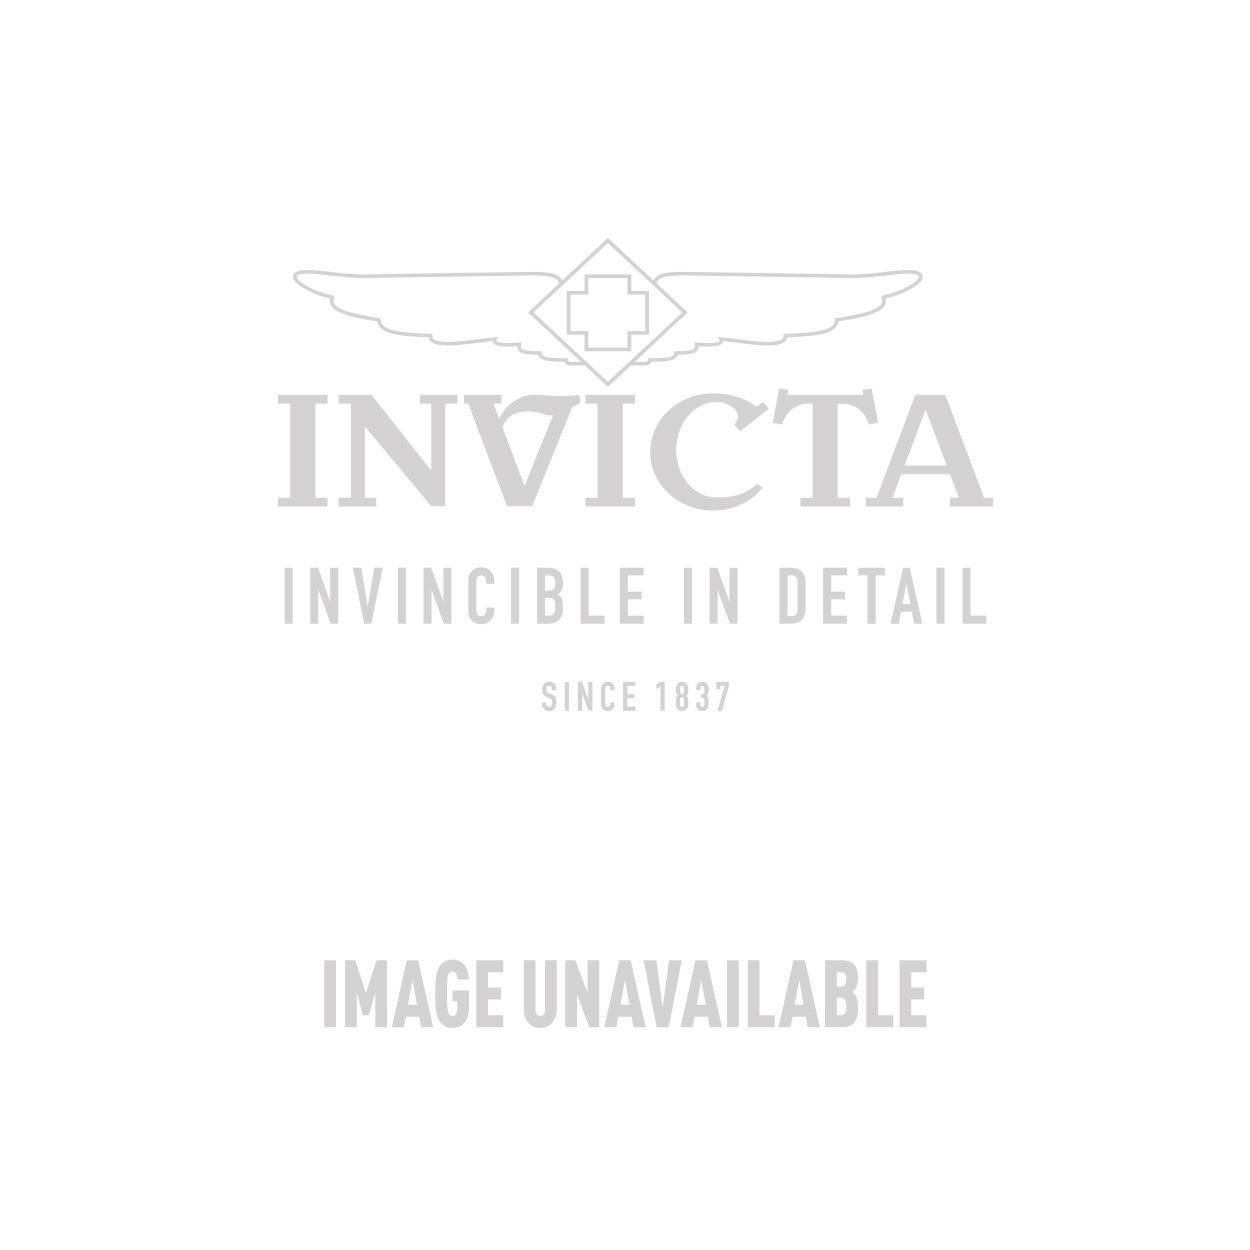 Invicta Aviator Quartz Watch - Gunmetal case with Black, Gunmetal tone Polyurethane band - Model 1239